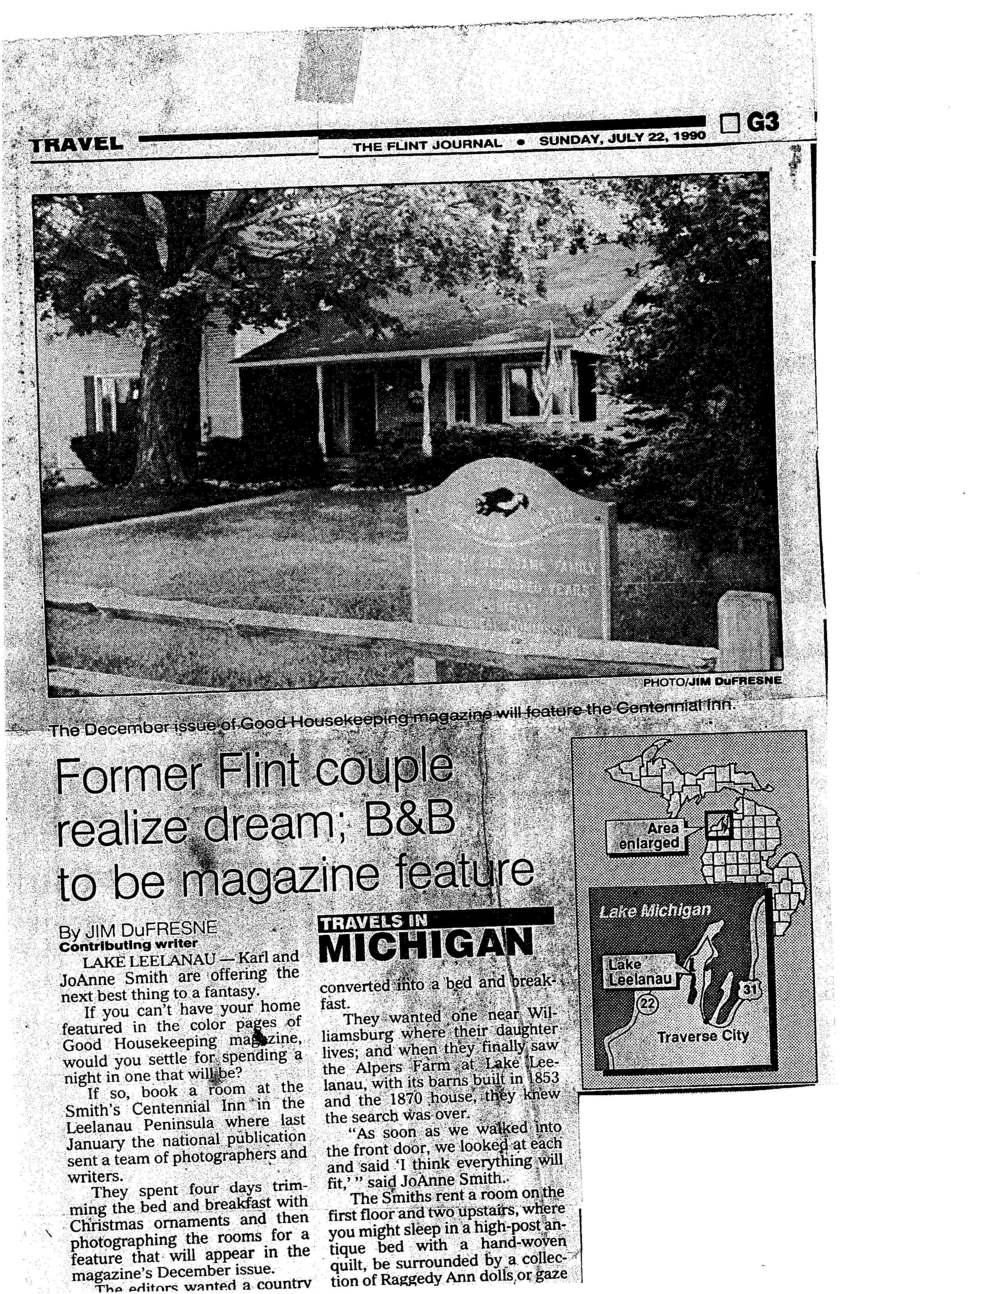 7251 E Alpers Road, Lake Leelanau, MI – Historic 1865 Centennial Inn For Sale By Oltersdorf Realty LLC Information Packet (19).jpg